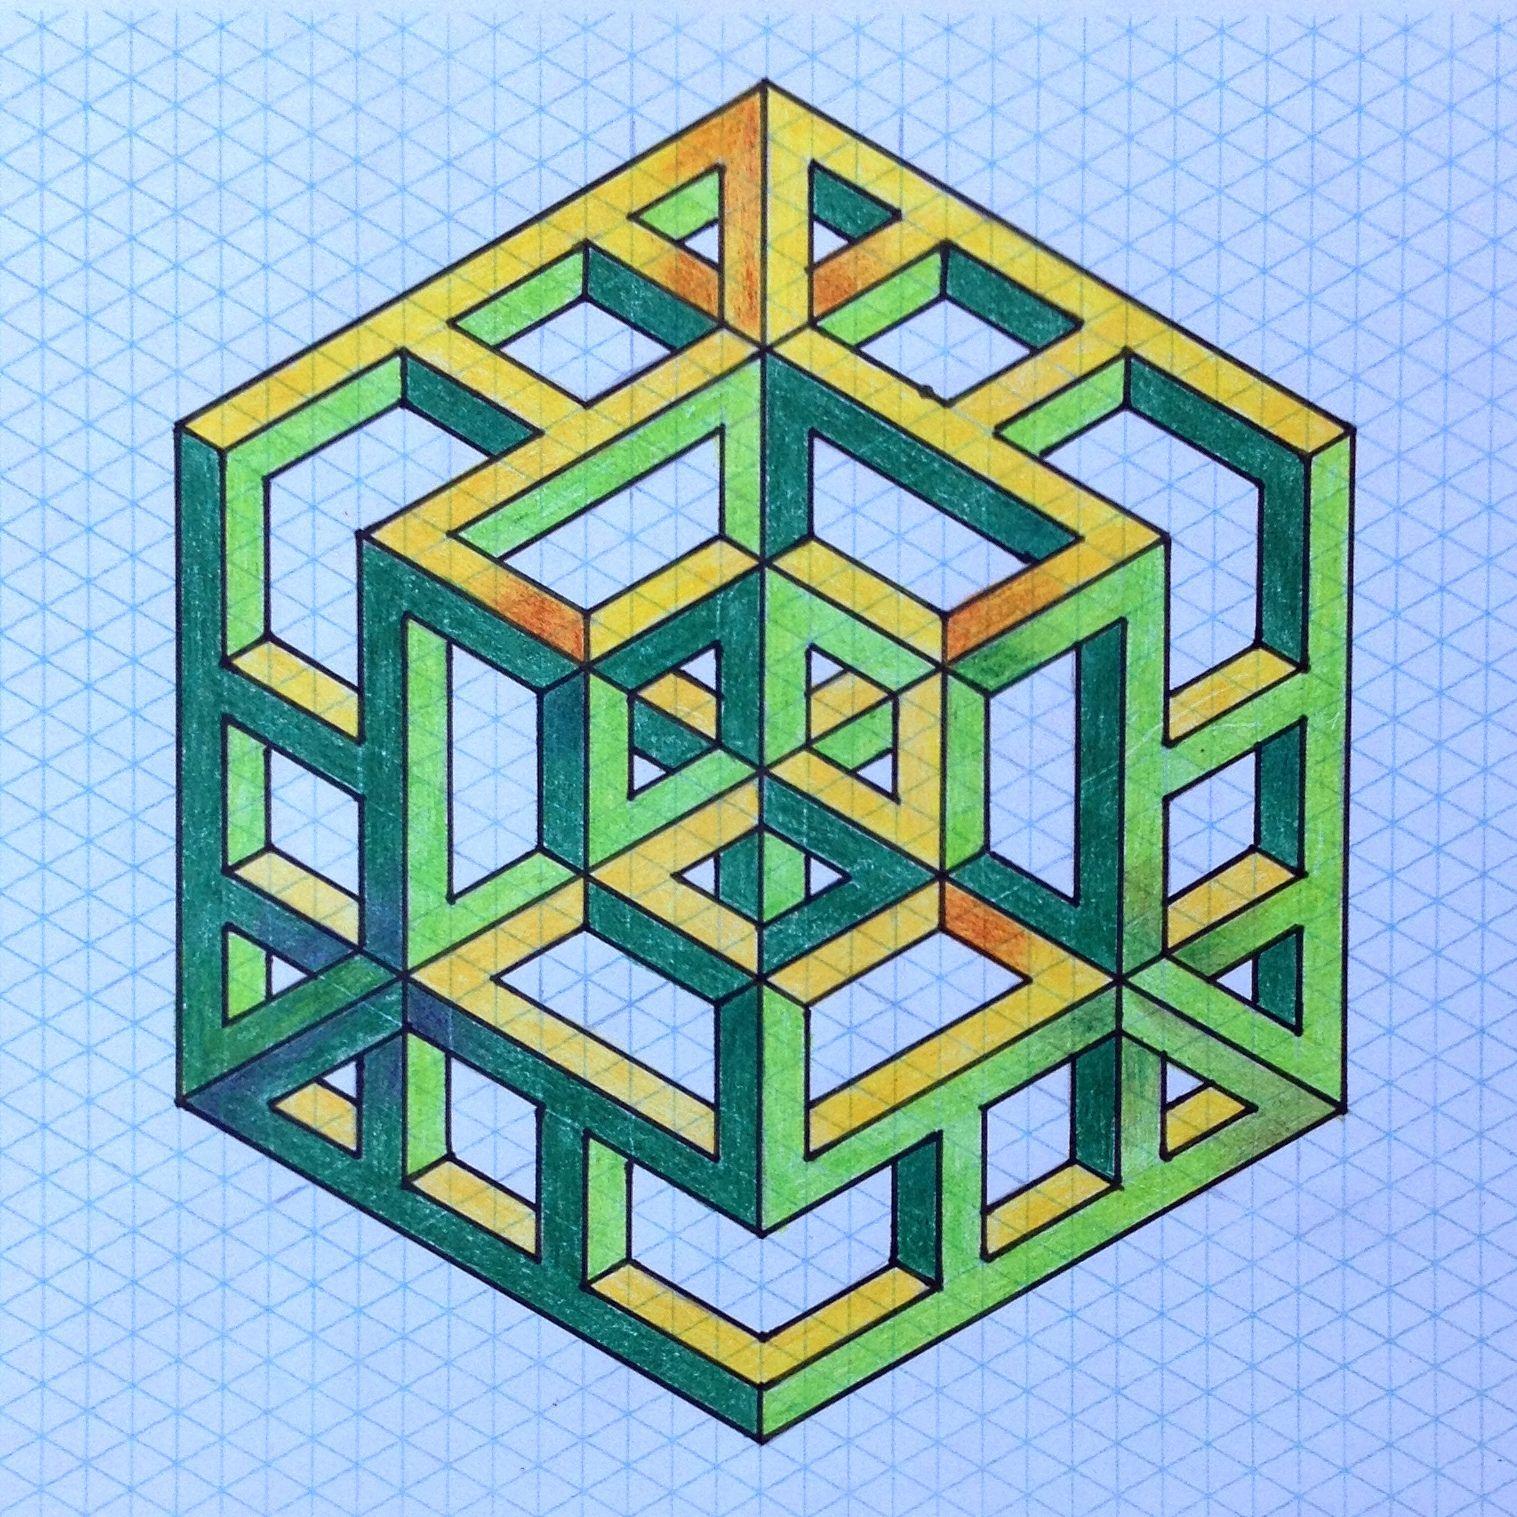 Regolo54 Impossible Isometric Penrosetriangle